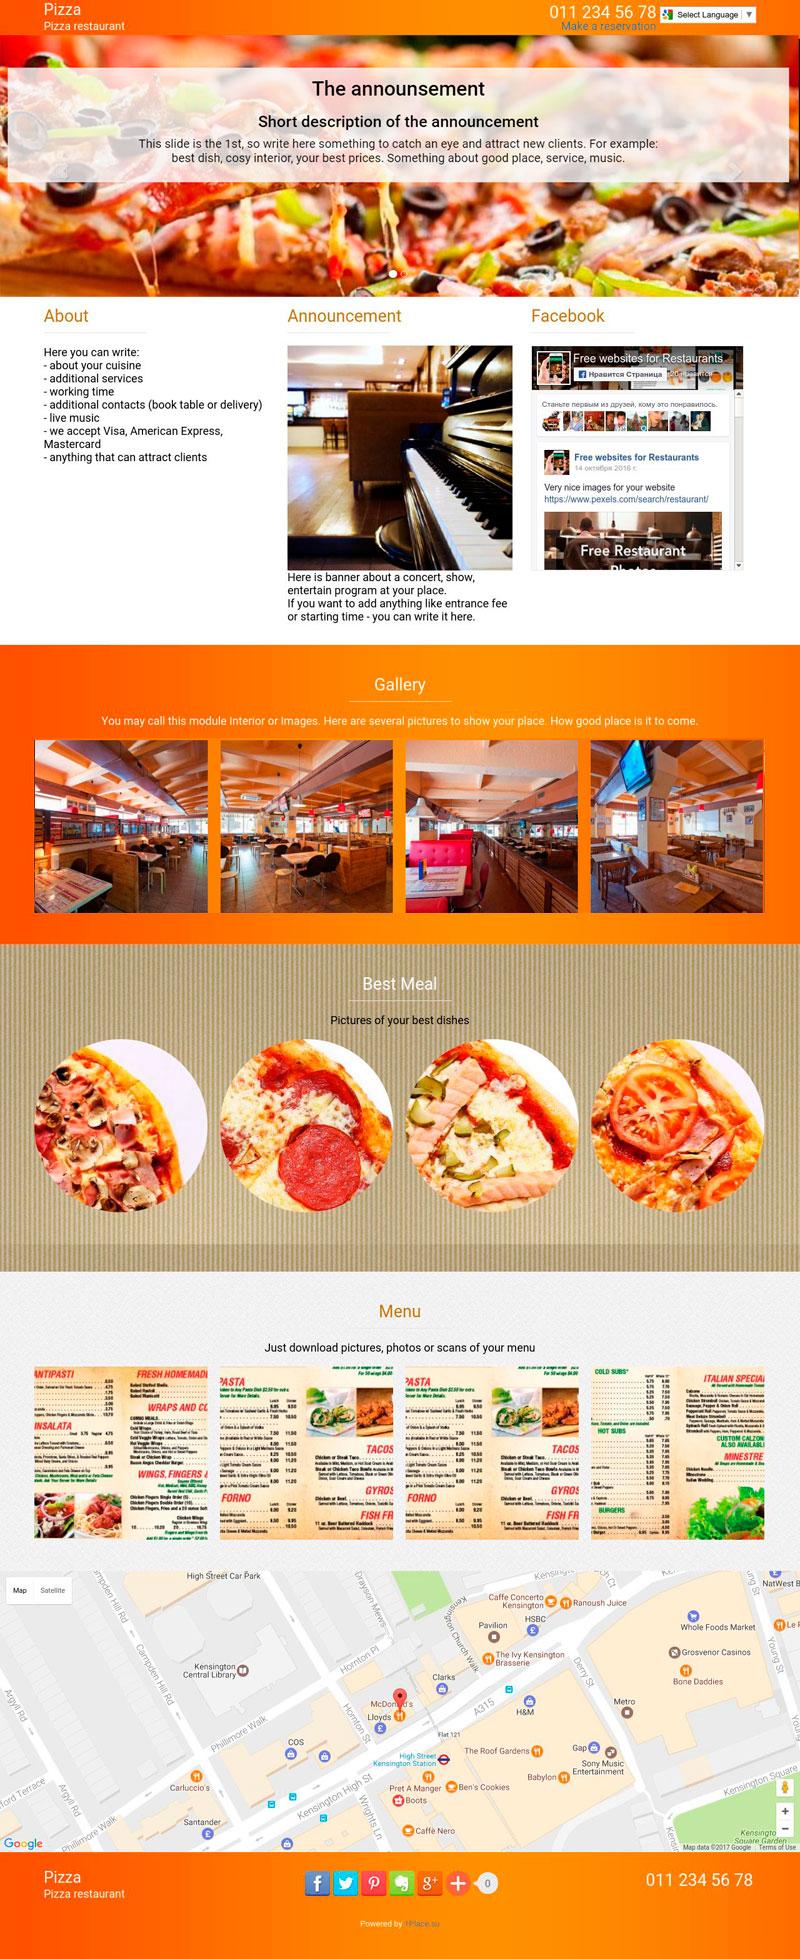 Template of a pizza restaurant website